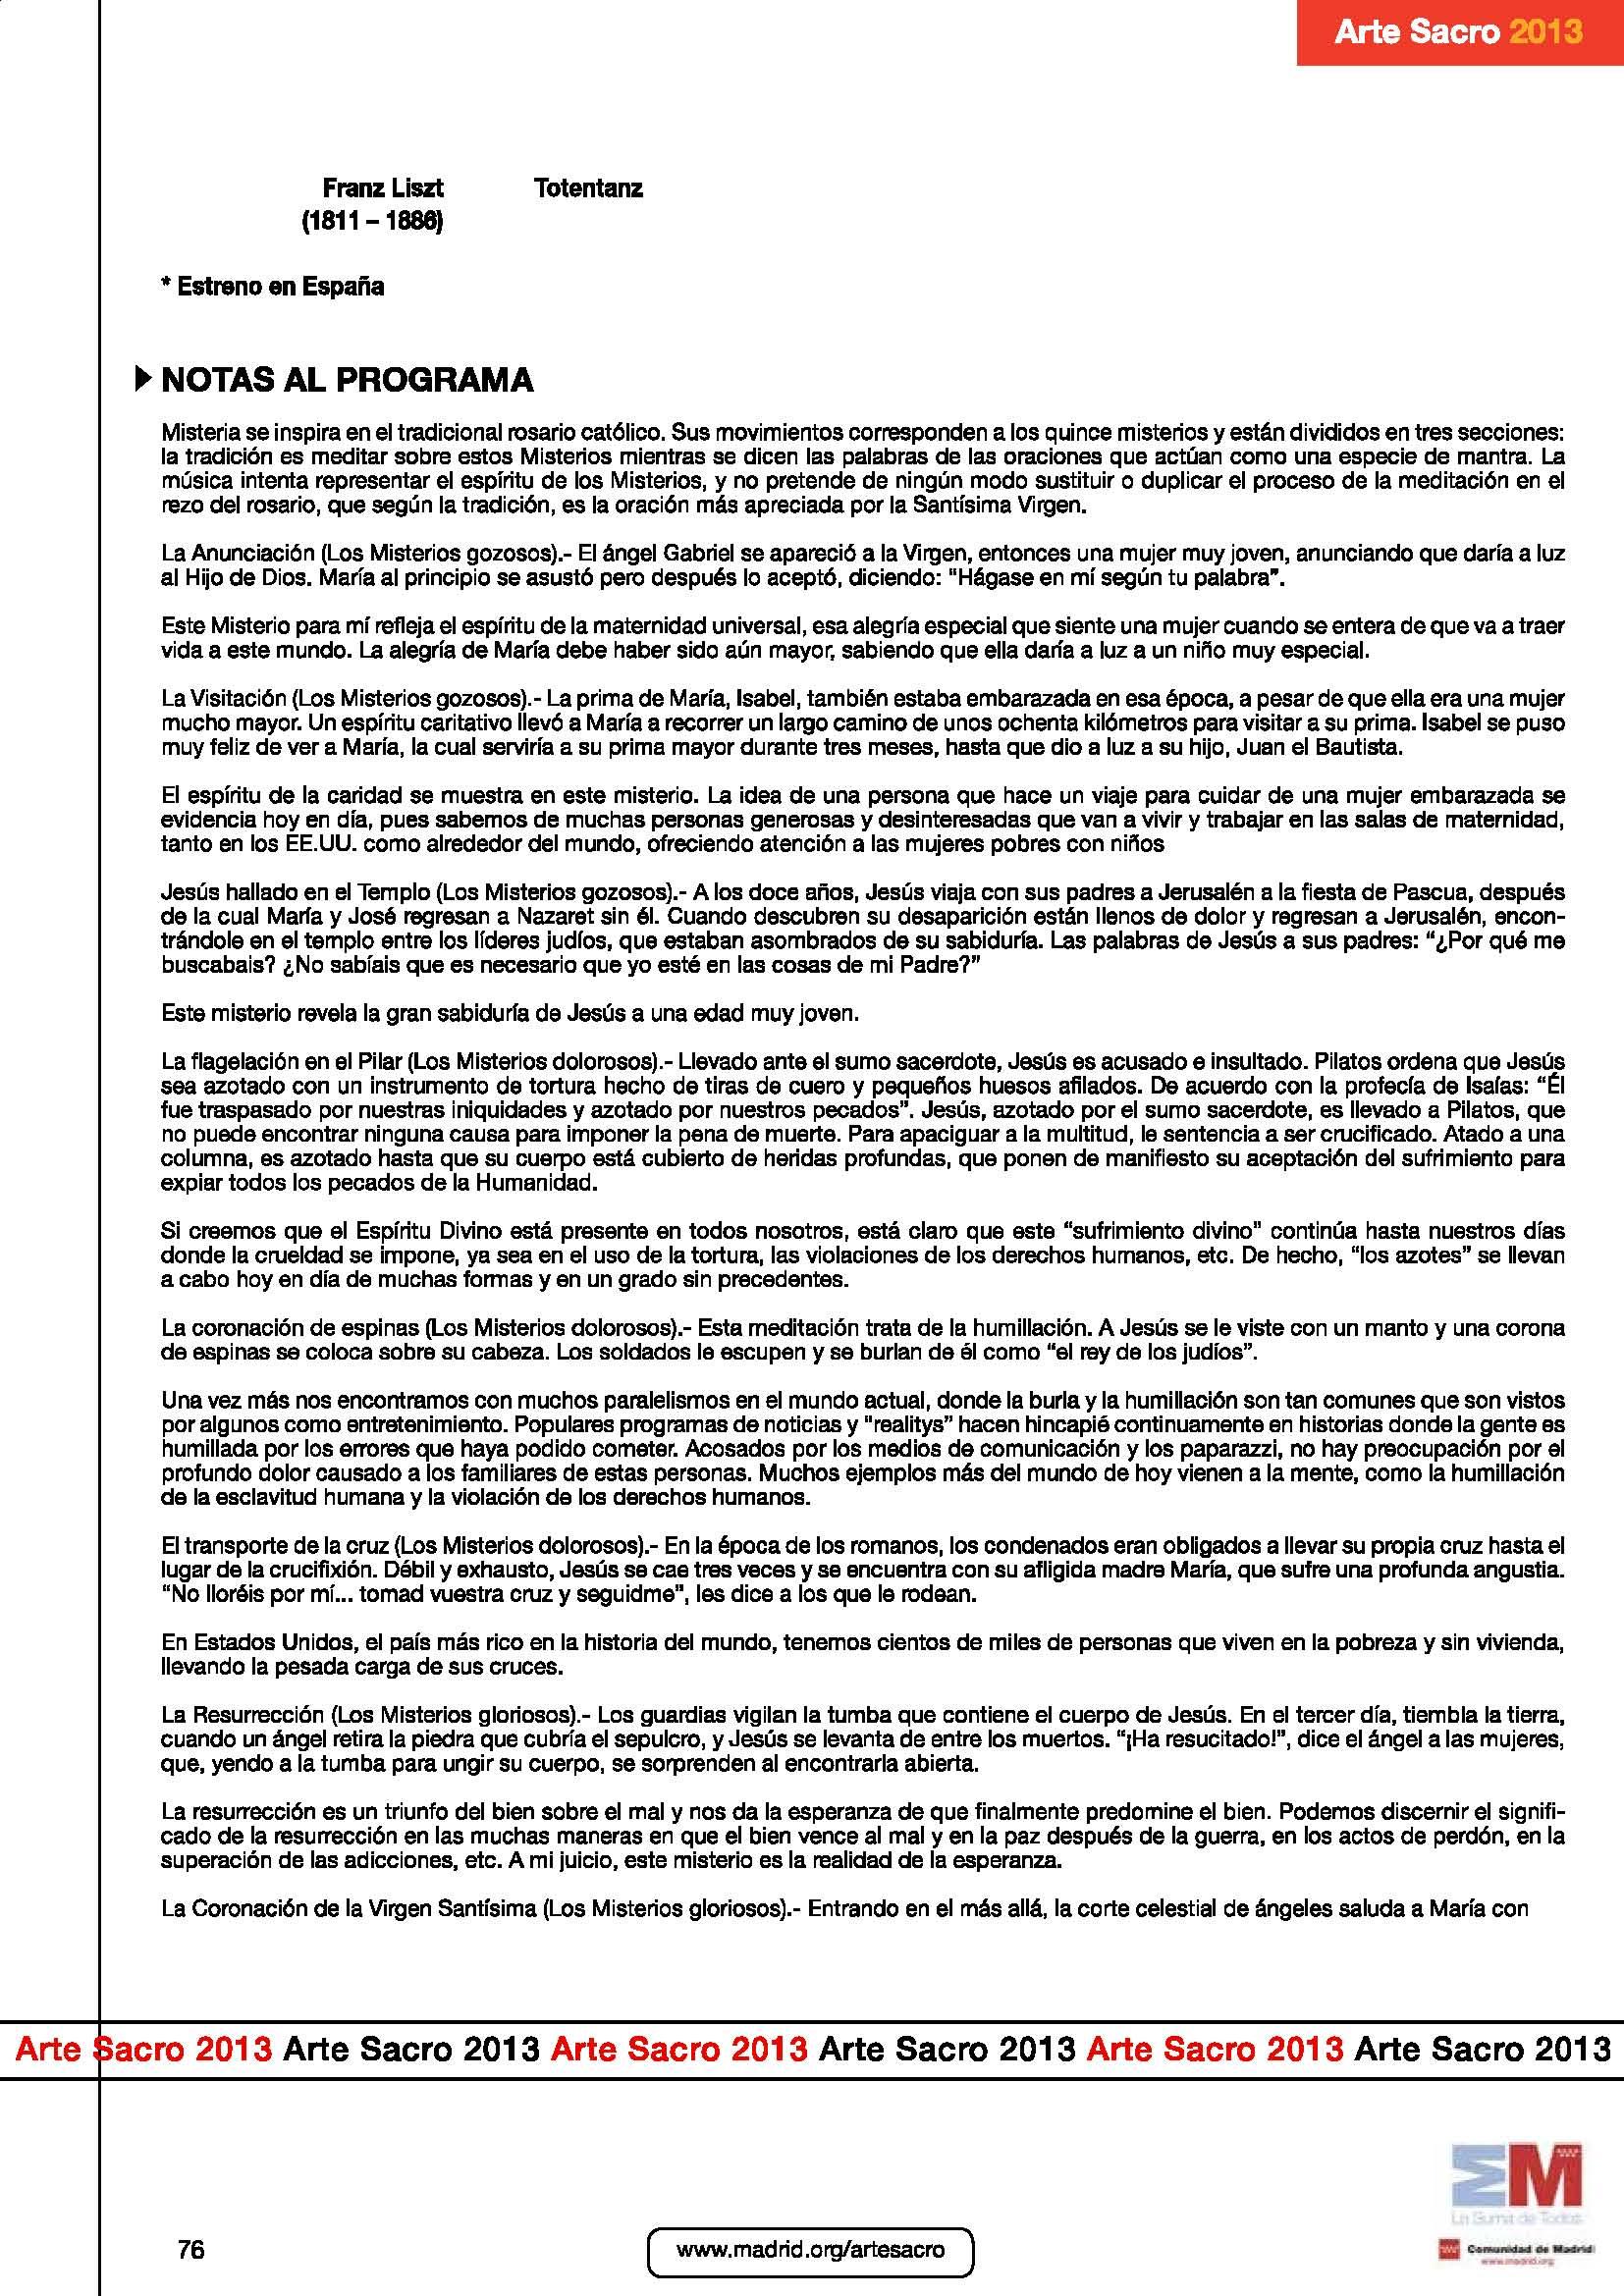 dossier_completo_Página_076